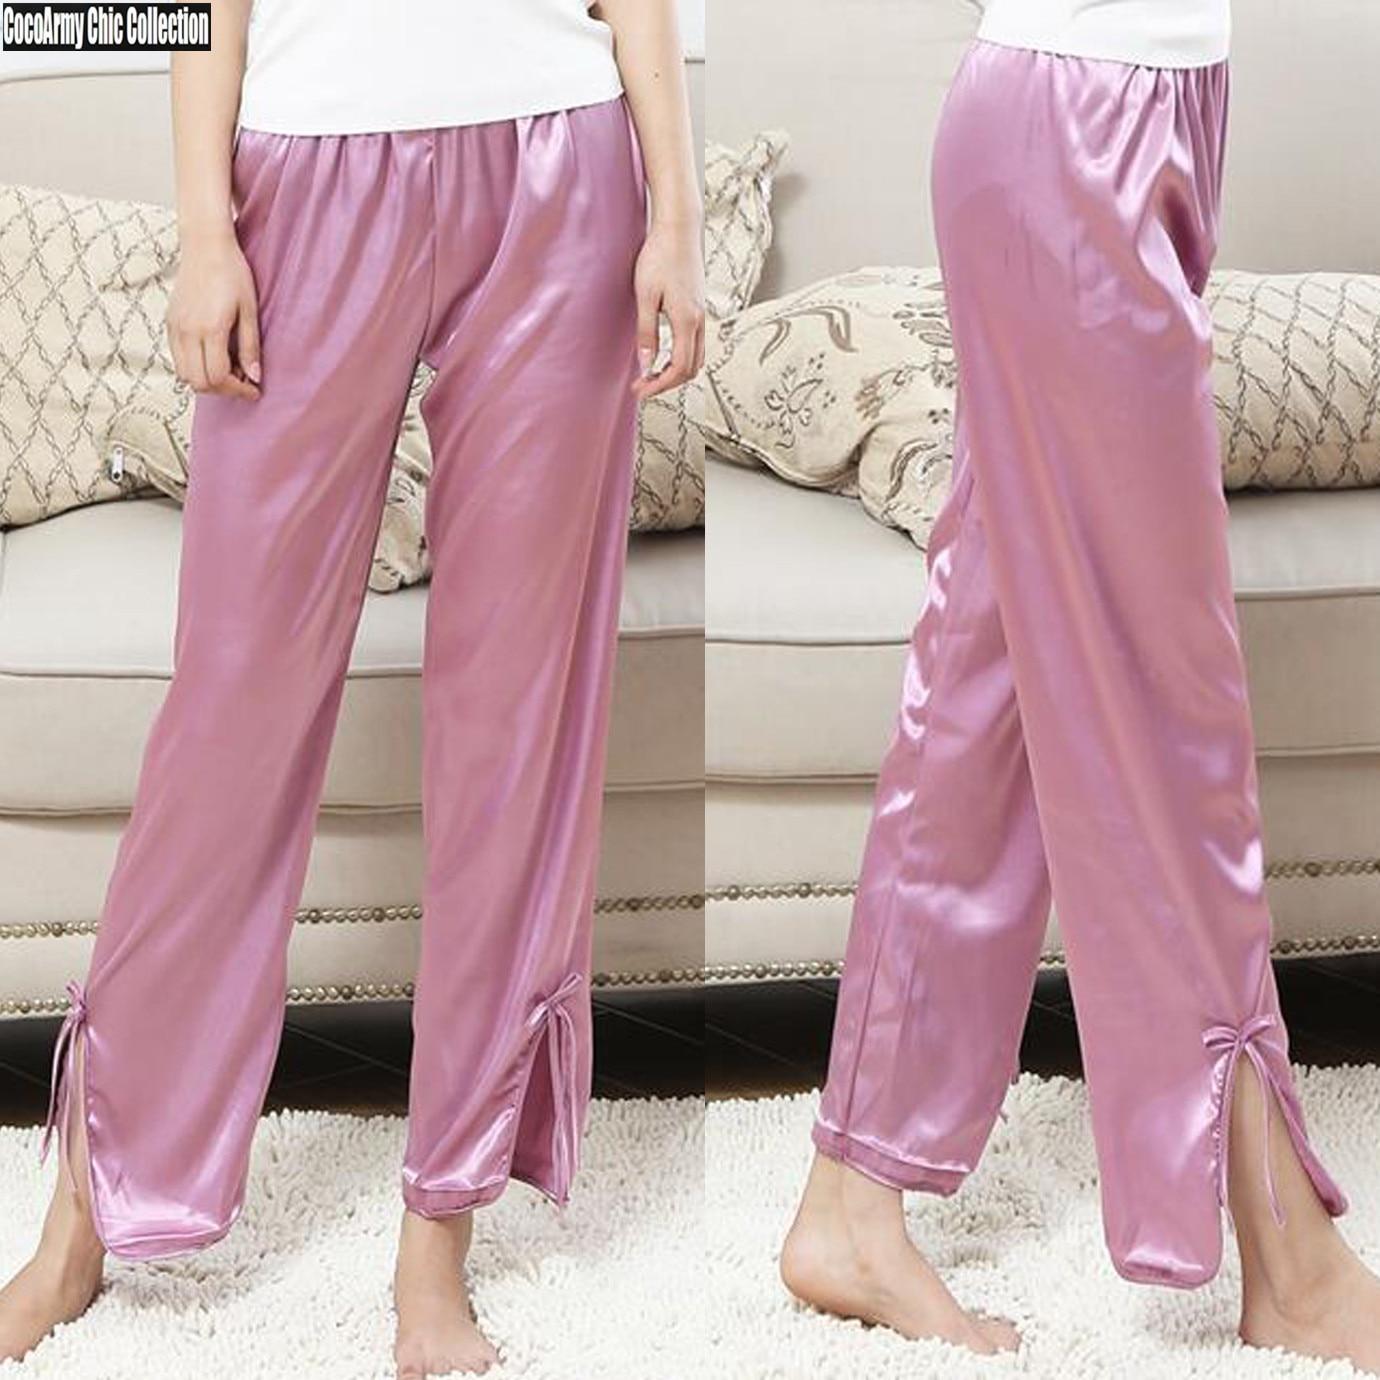 Fashion Soft Satin Silk Pajama Pants with Bottom Slit Bow Design ... 45f48d5d7